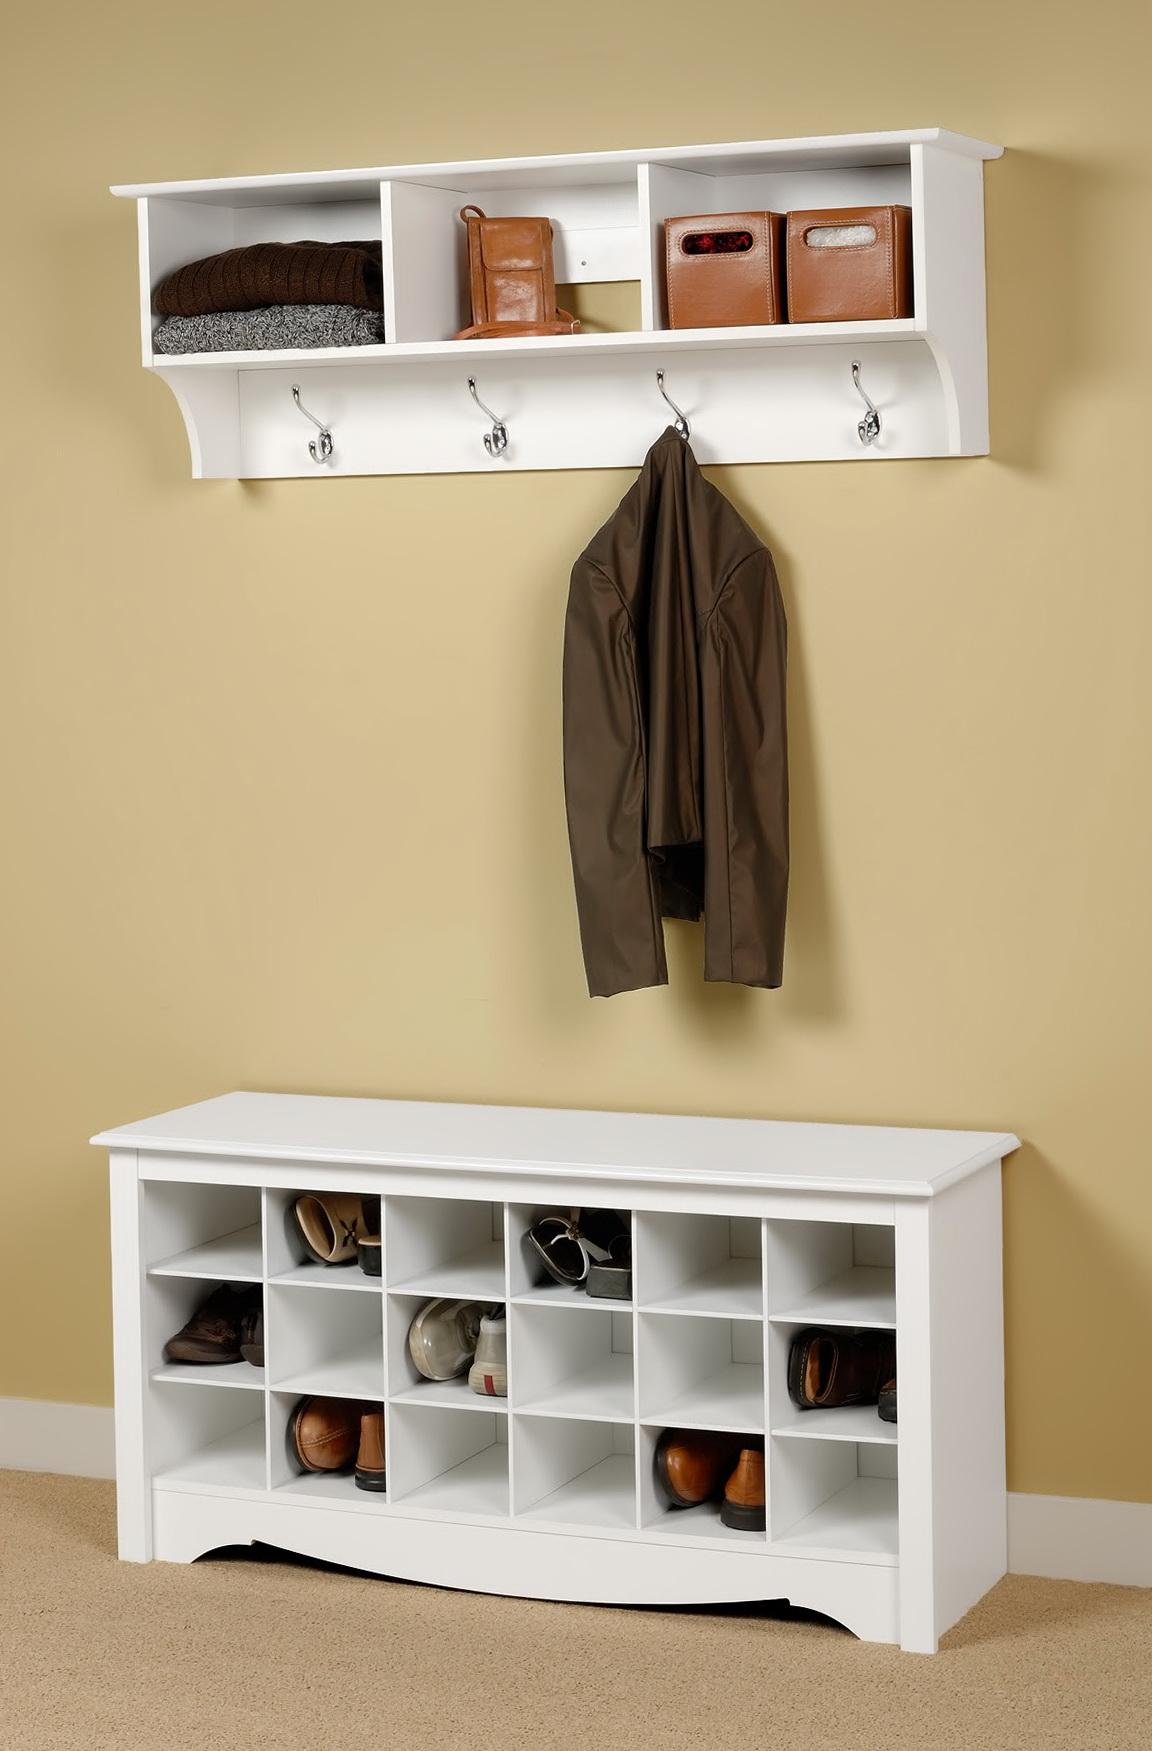 Ikea Shoe Rack Bench Home Design Ideas